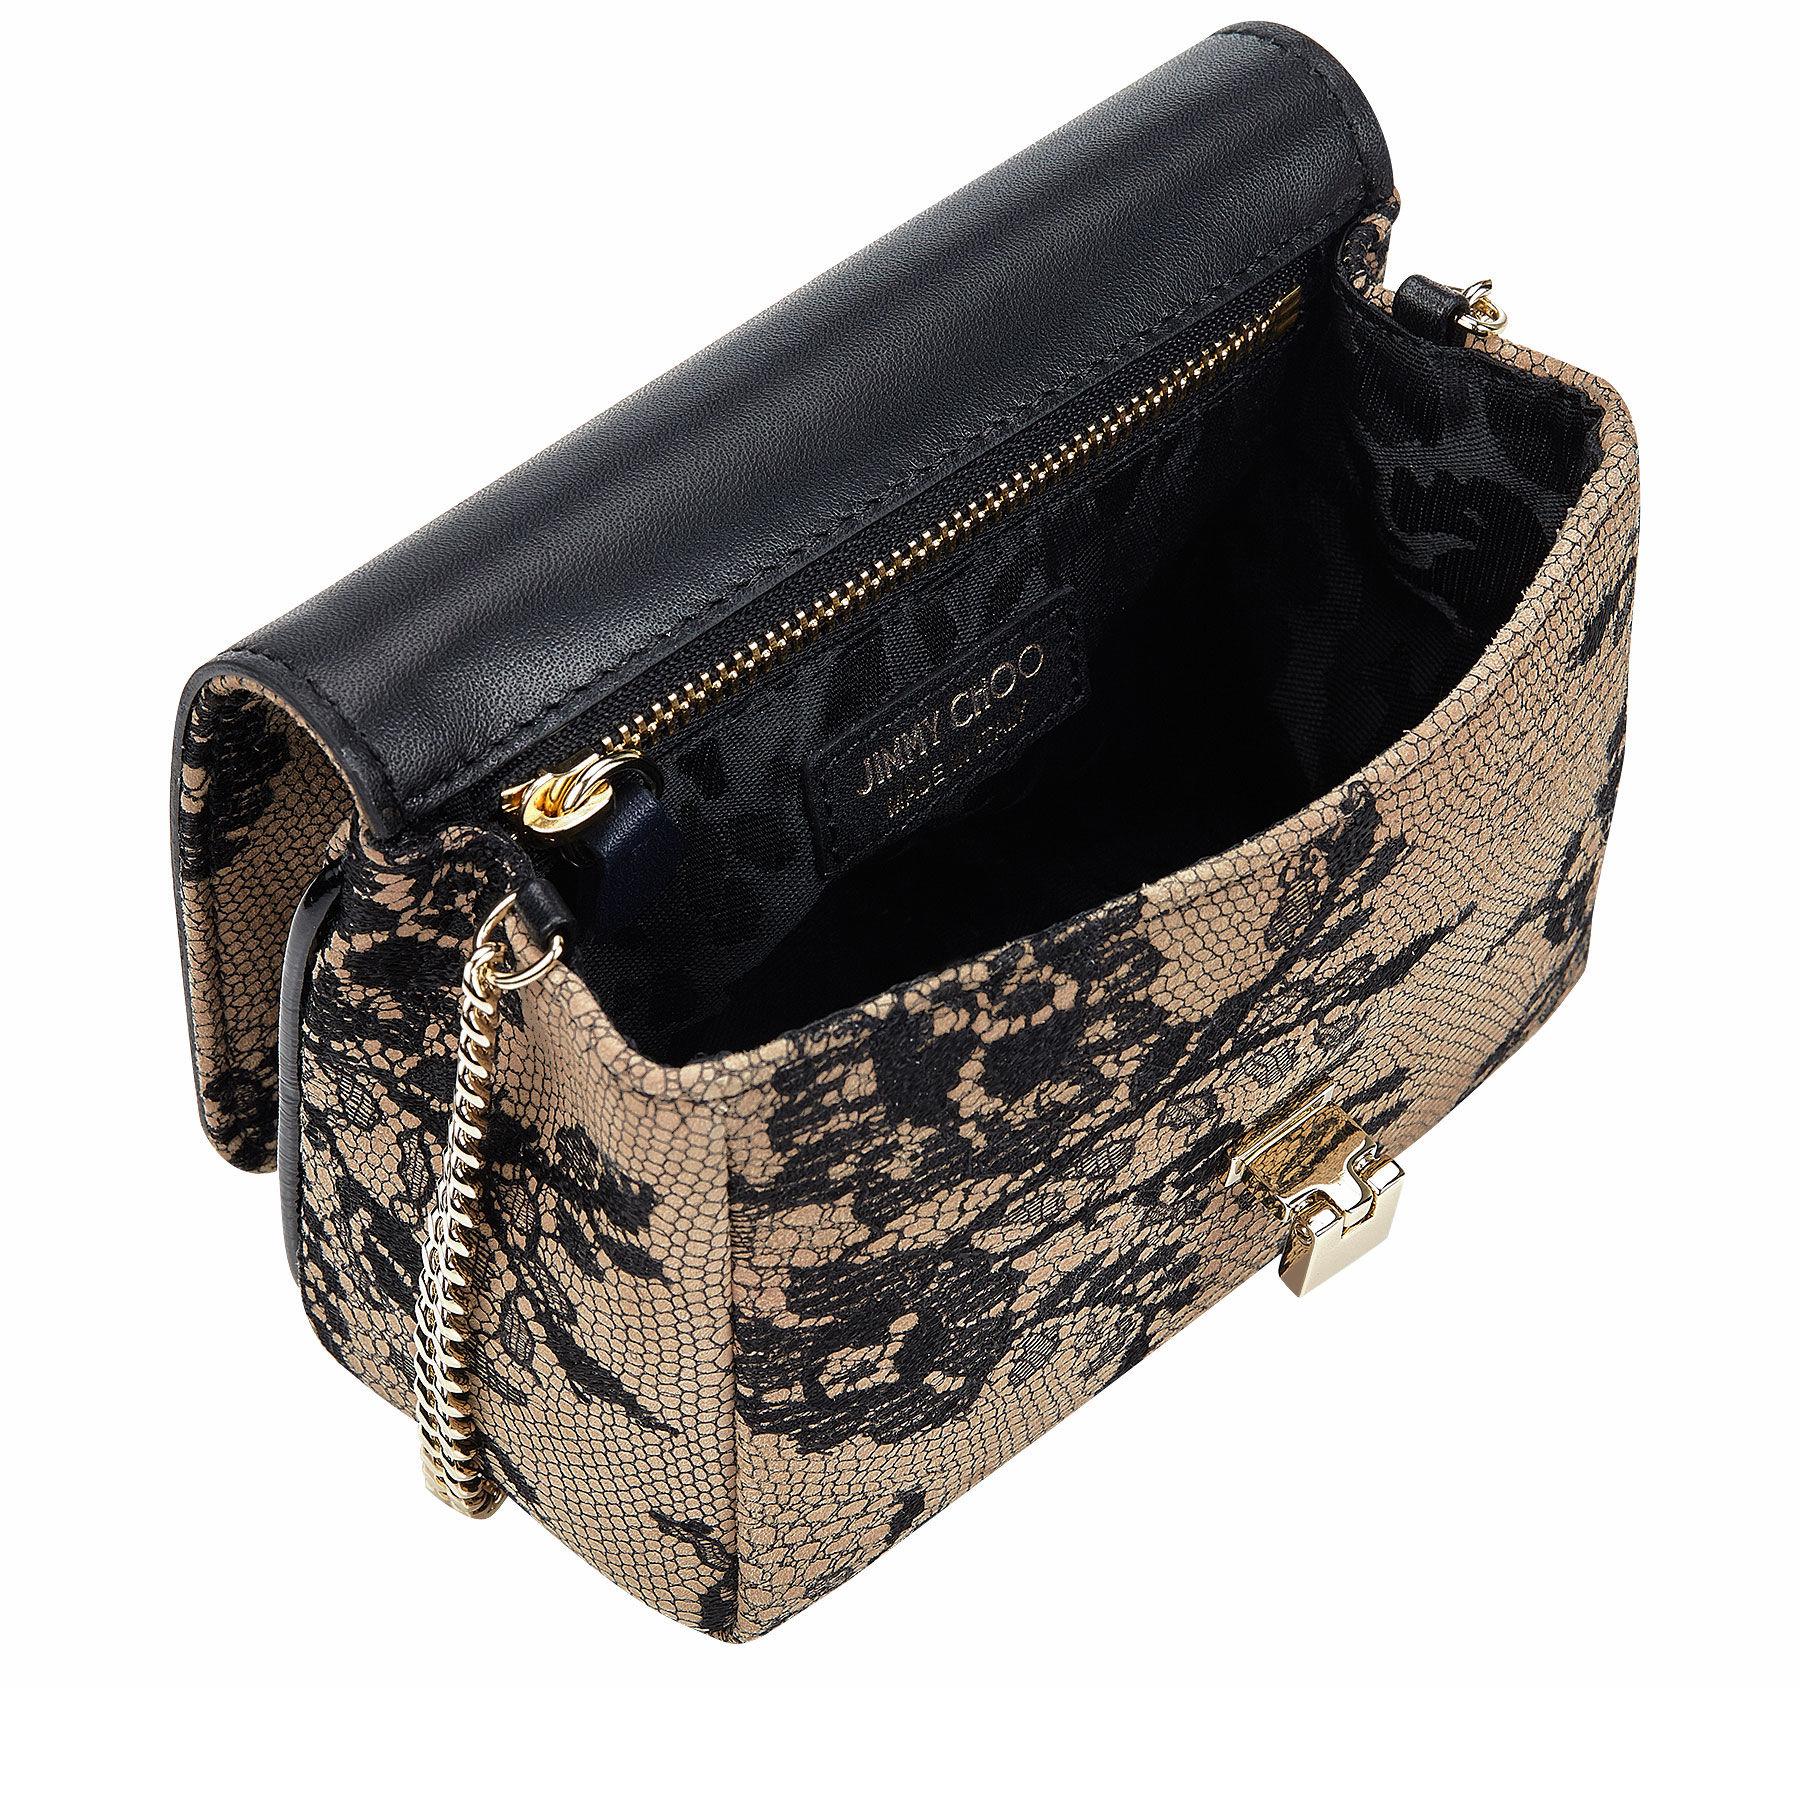 8b99e2447a3c Jimmy choo Ruby Black Lace On Leather